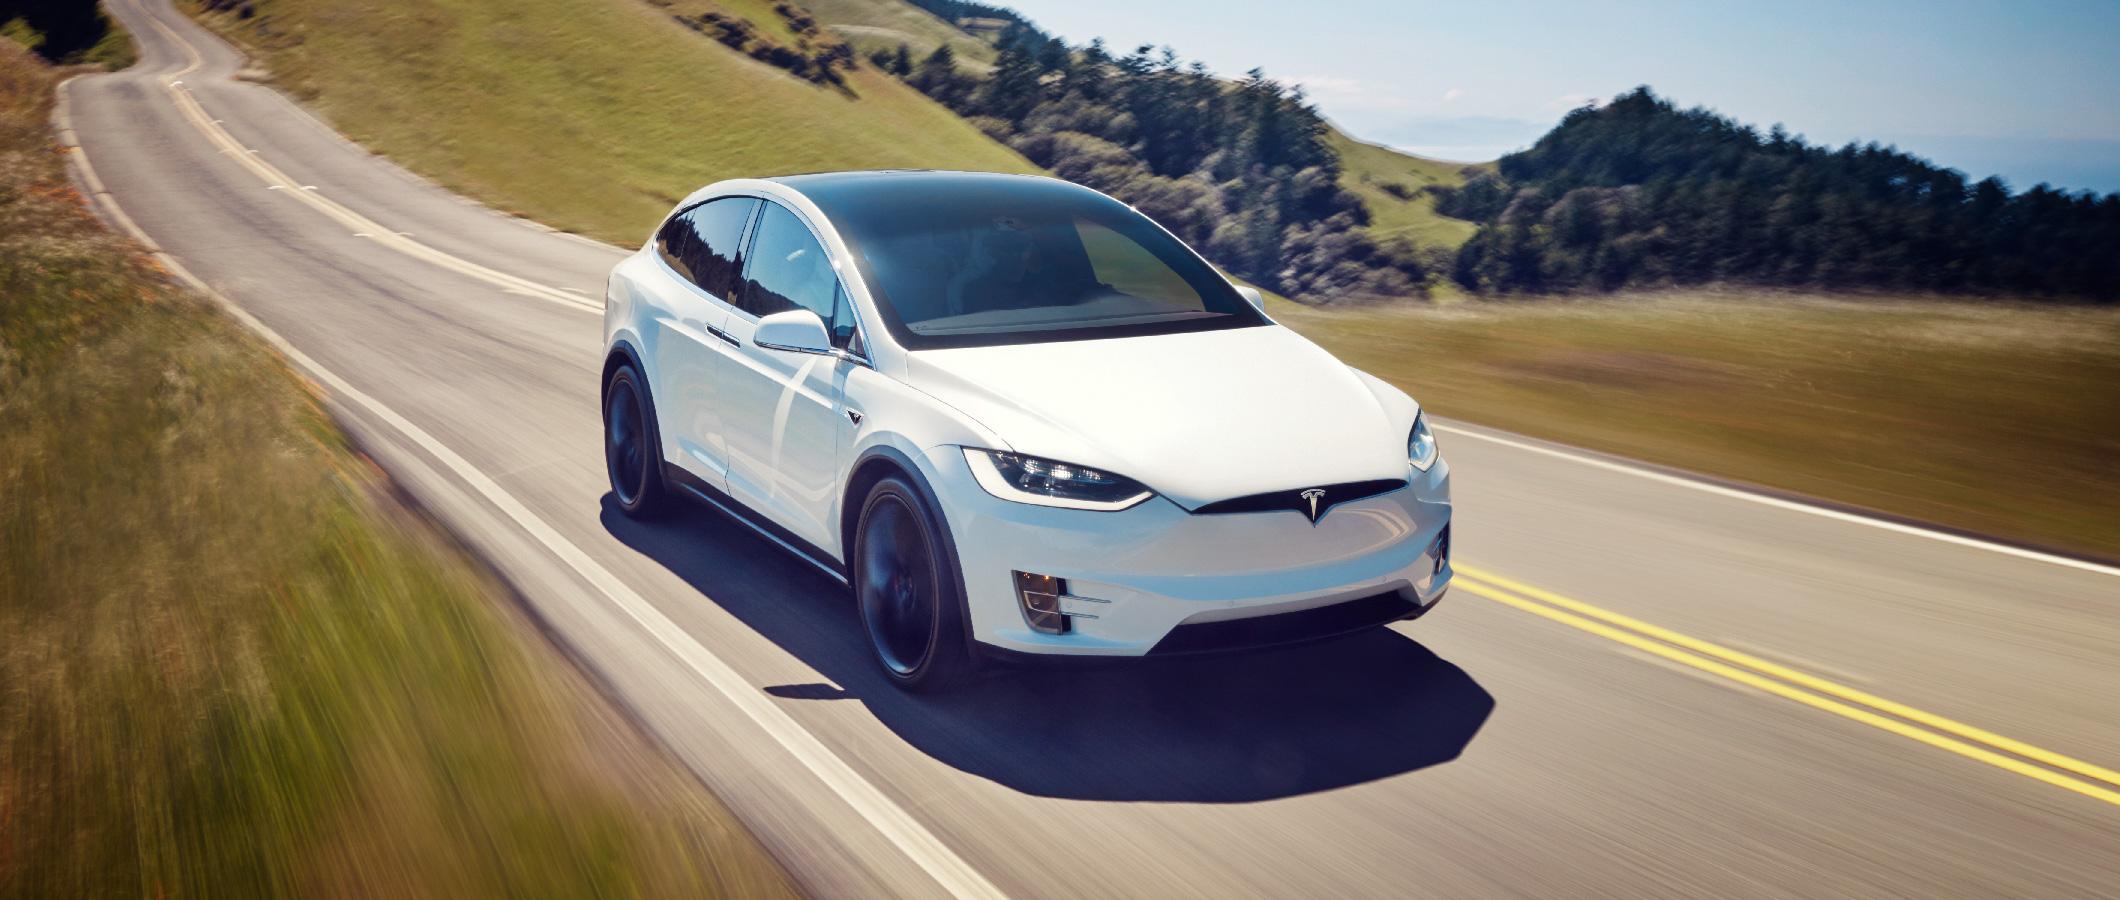 Tesla graduate careers